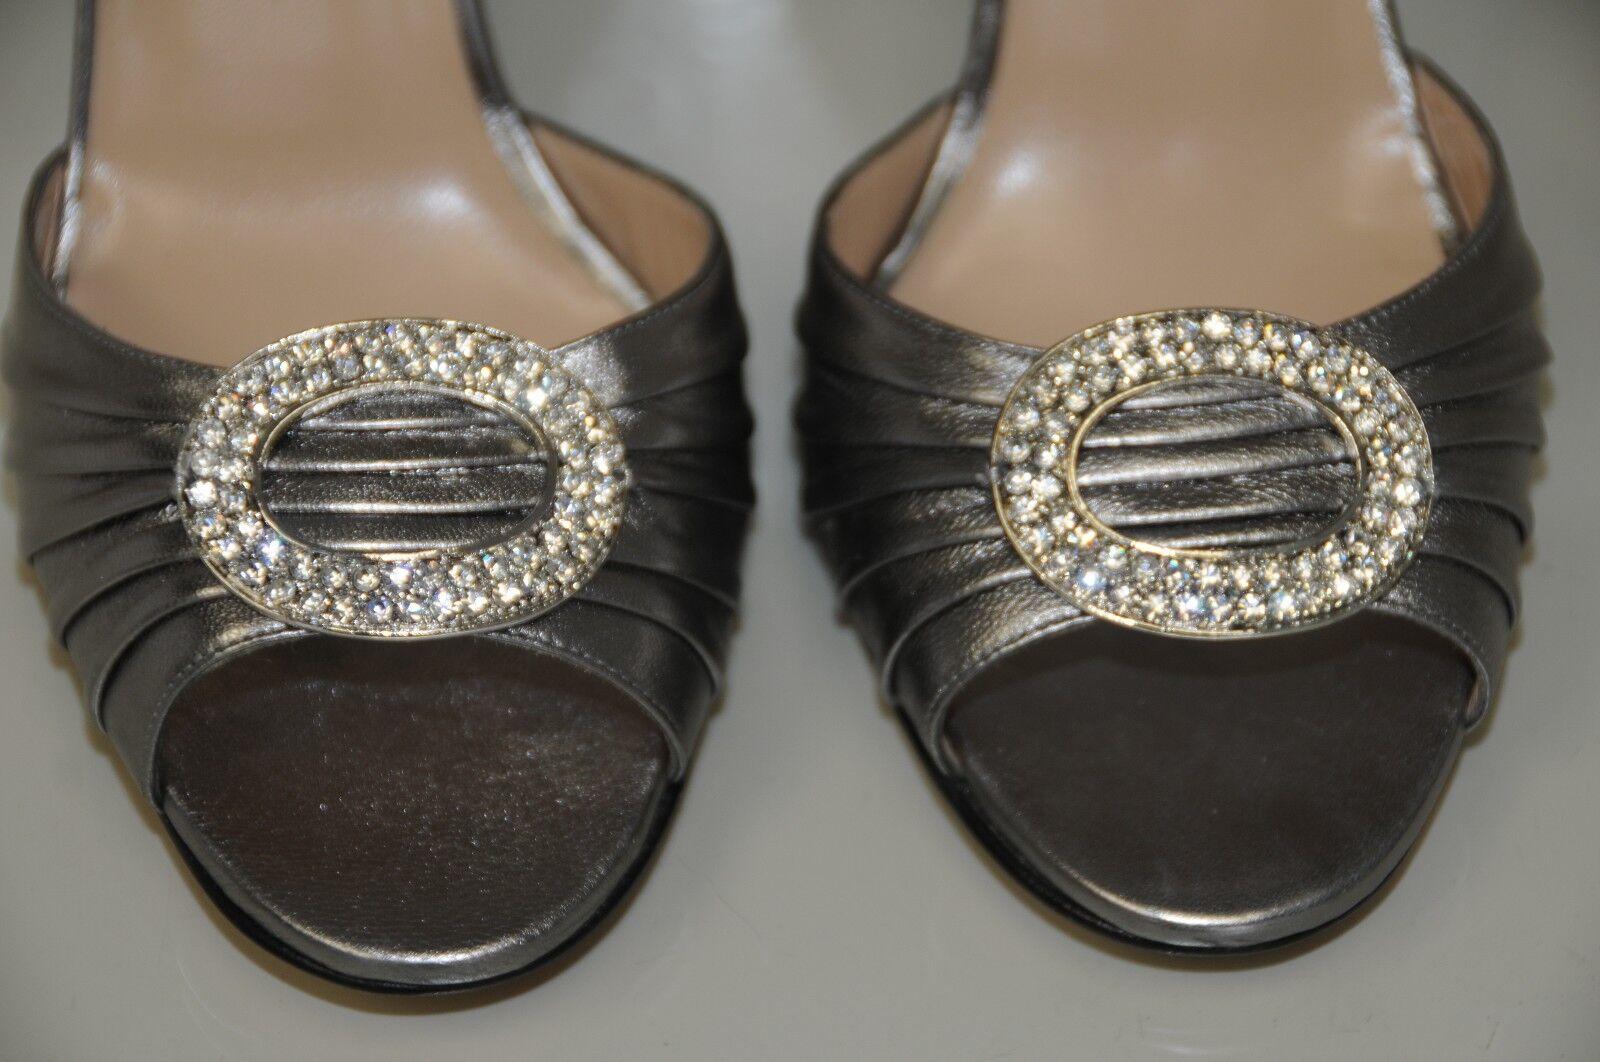 New MANOLO BLAHNIK SEDARABY BIJ 105 Silver Metallic Jewele Wedding SHOES 40 41.5